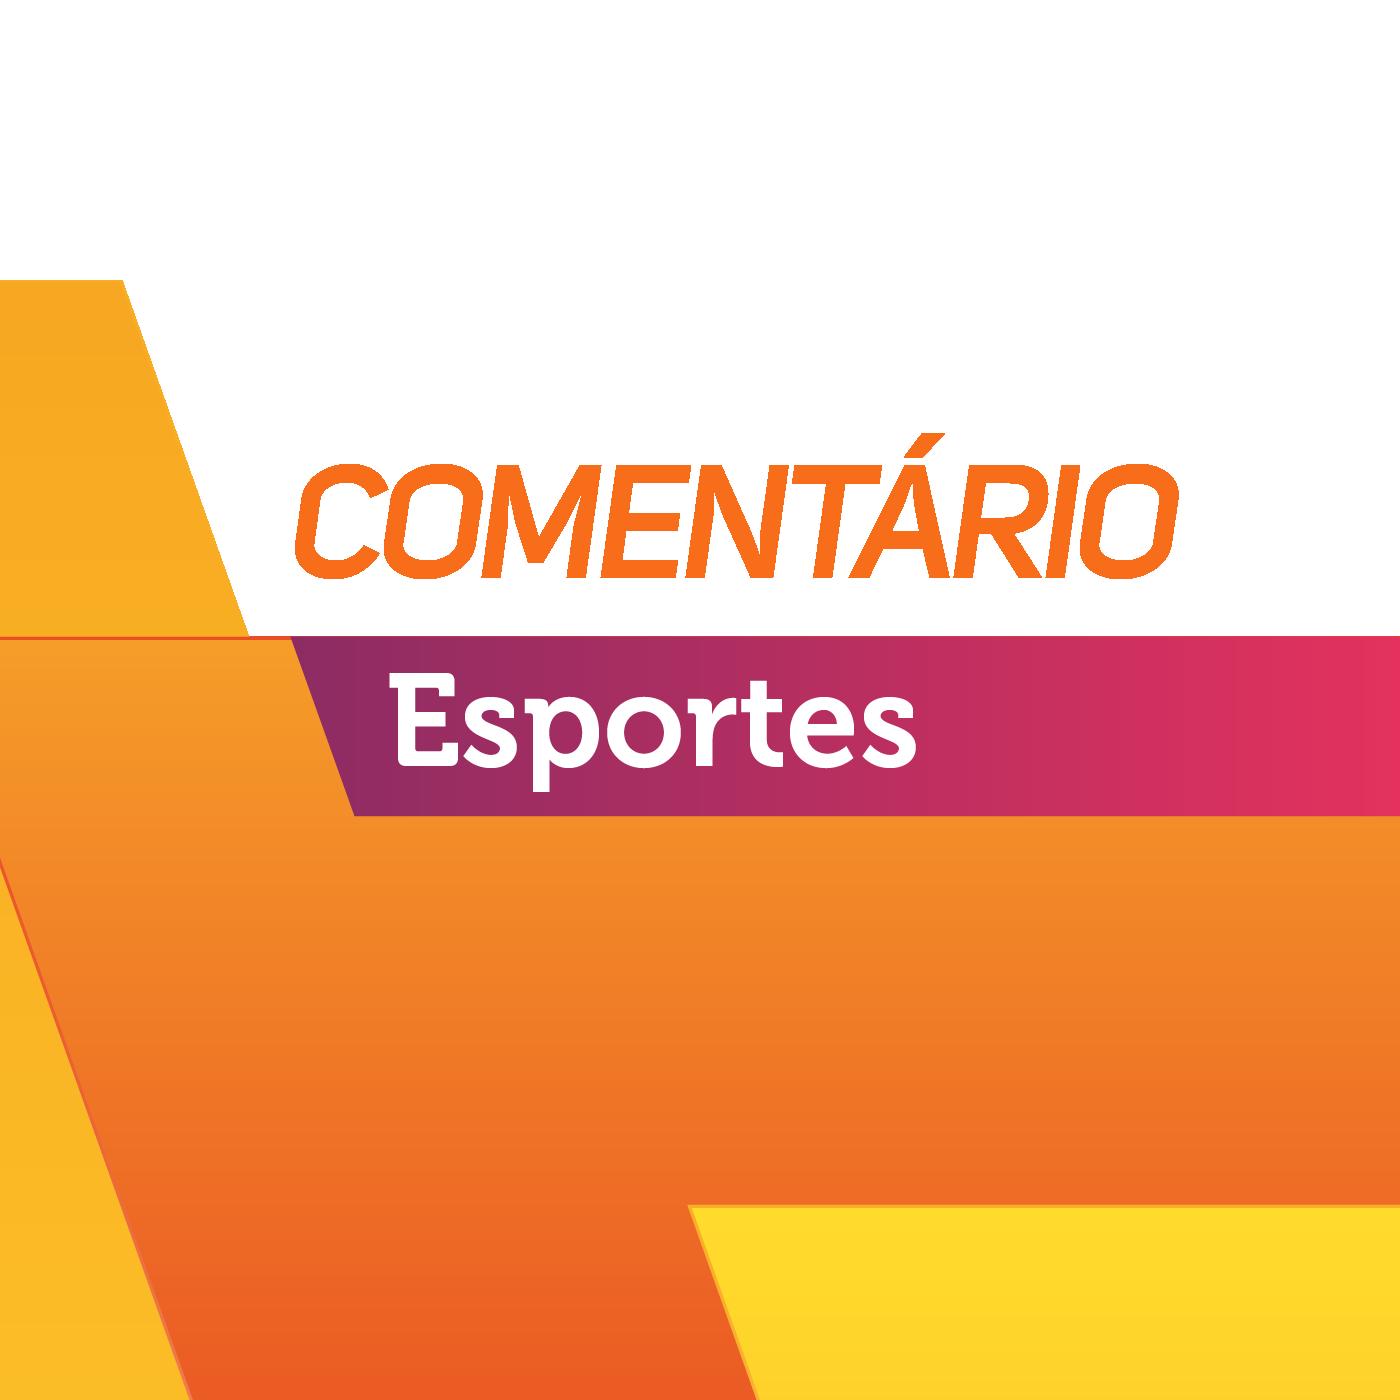 Pedro Ernesto comenta no Esportes Ao Meio Dia - 18/02/2018